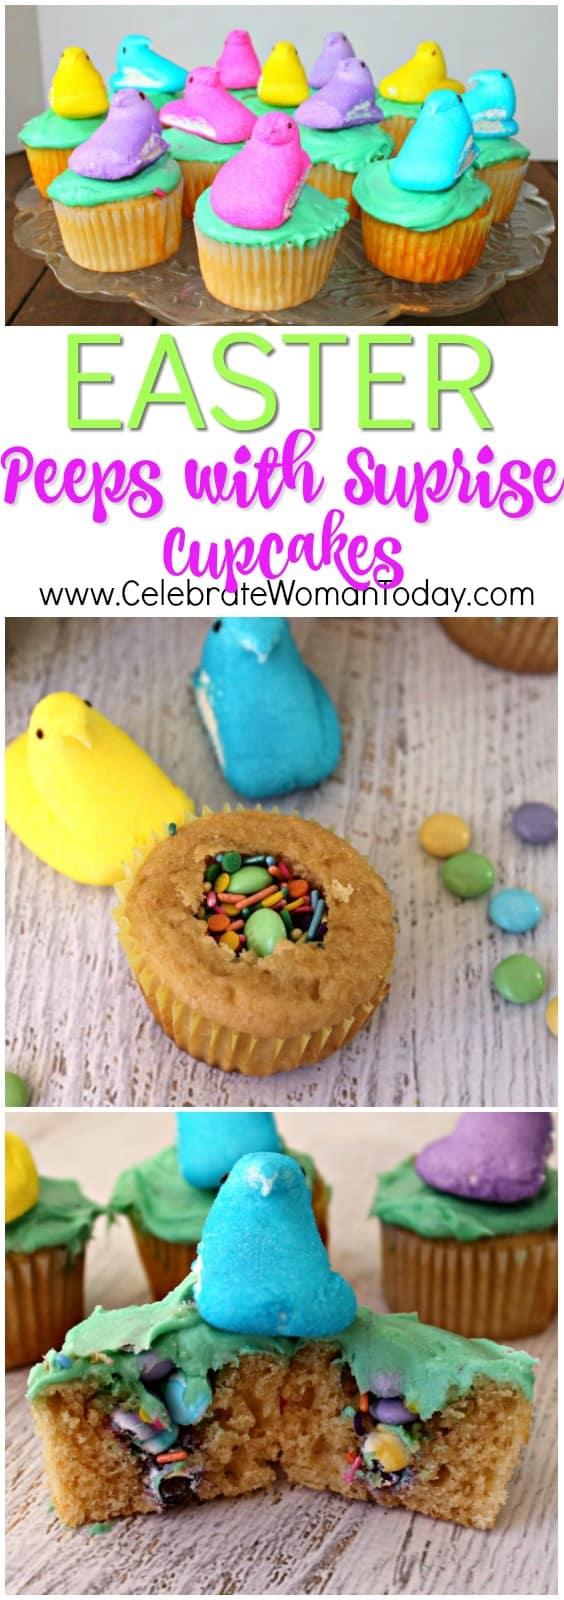 Easter Peeps Surprise Cupcakes